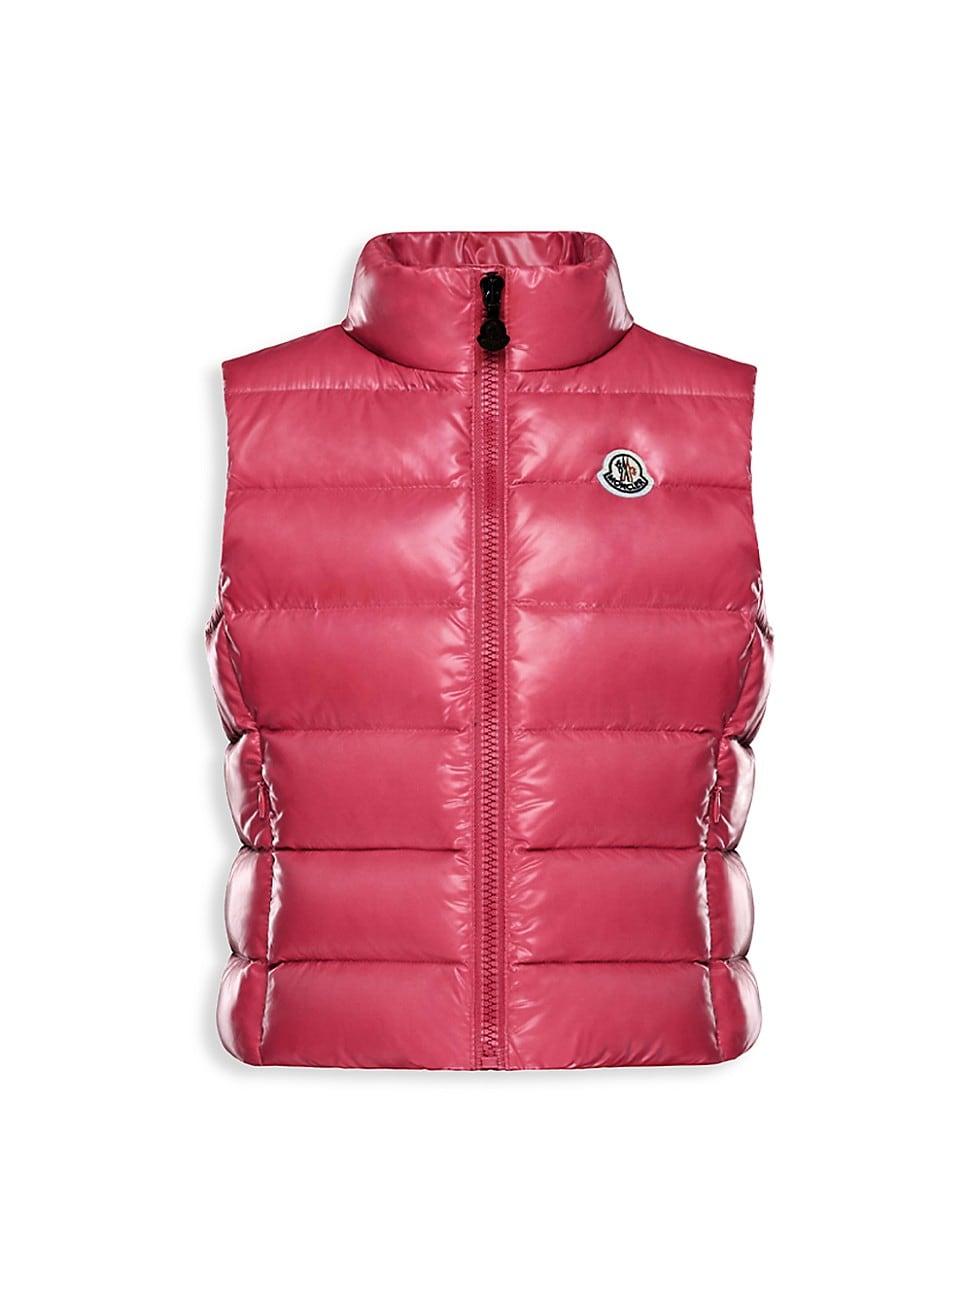 Moncler Girls' Ghany Down Puffer Vest - Little Kid, Big Kid In Dark Pink